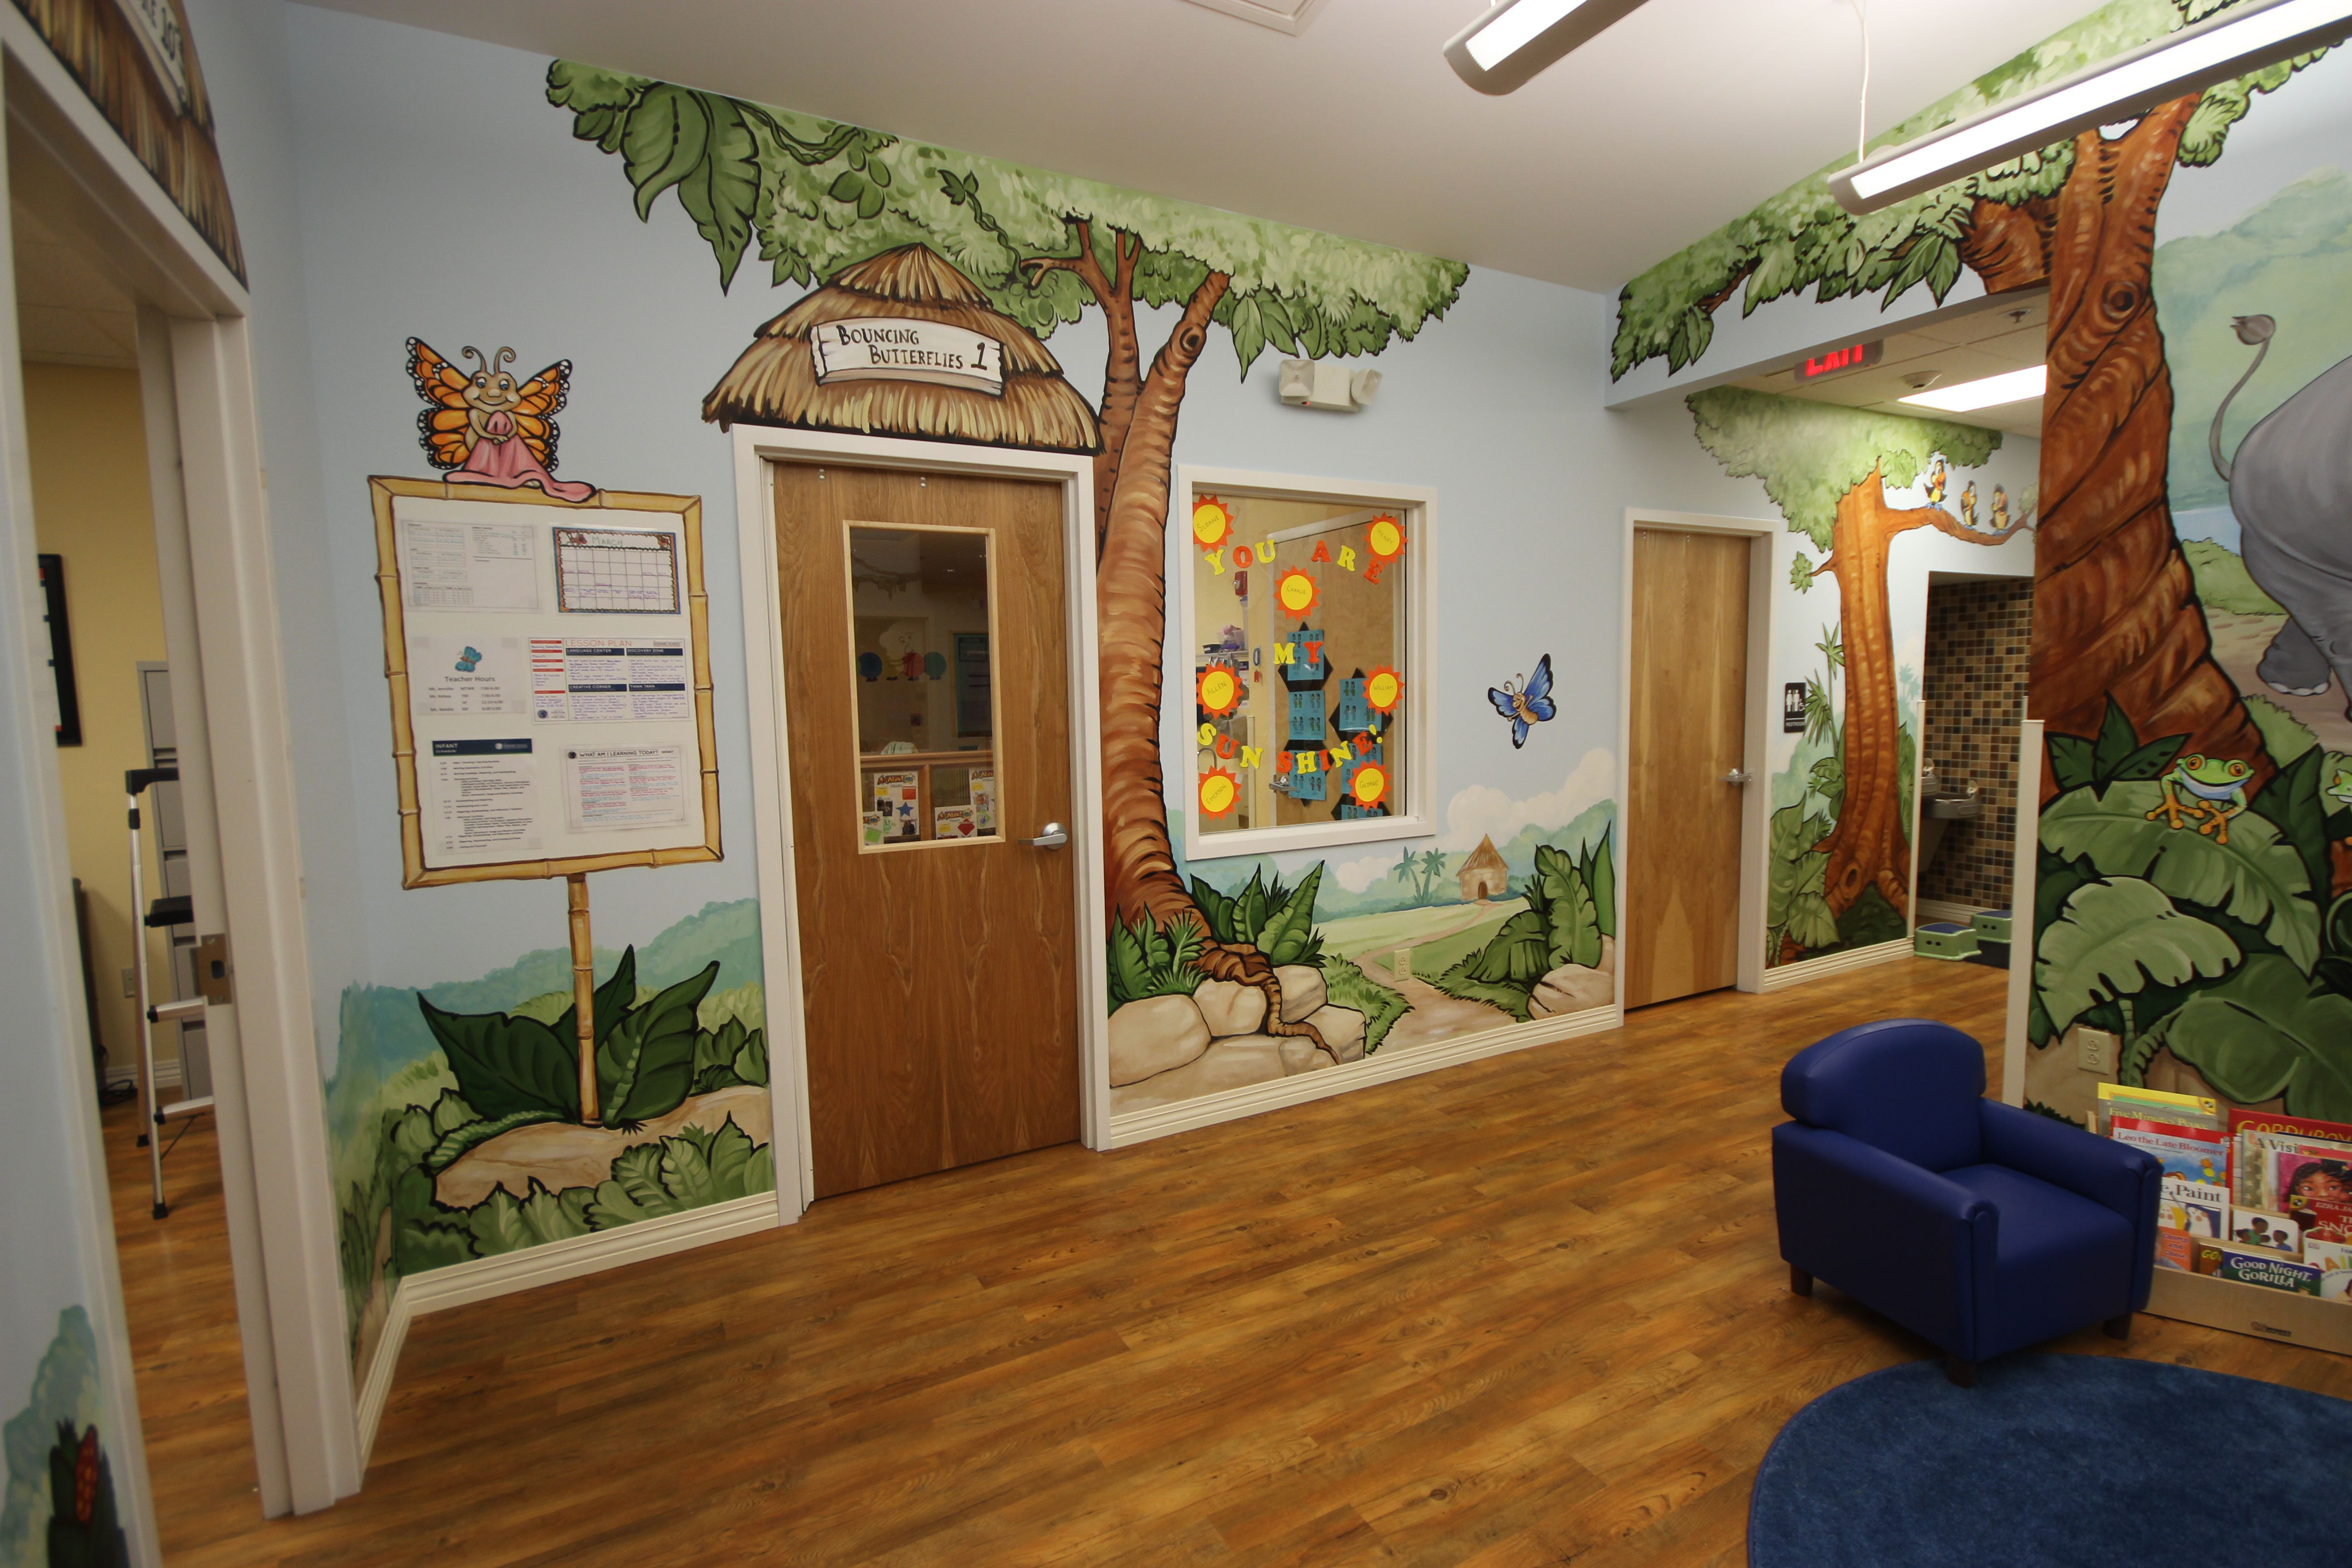 The Bouncing Butterfly Classroom Murals Murals By Emily Ross Wwwemagination Studios